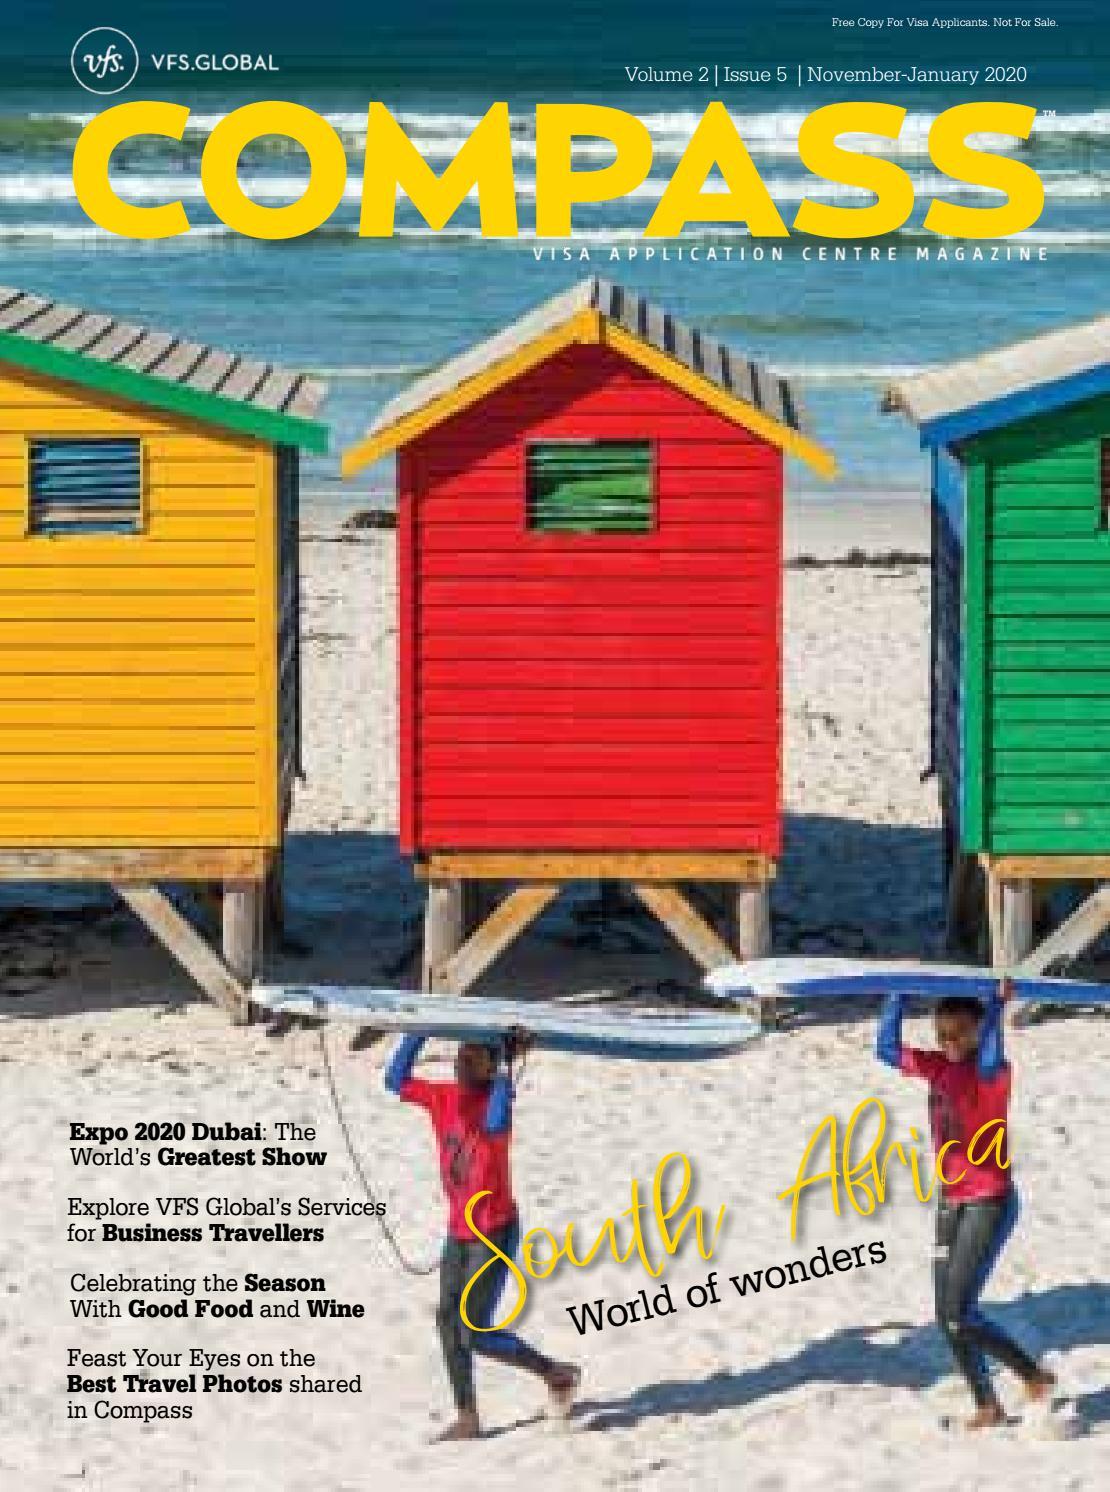 Vfs Global Compass Uae Edition November 2019 January 2020 By Maxposure Media Group India Pvt Ltd Issuu